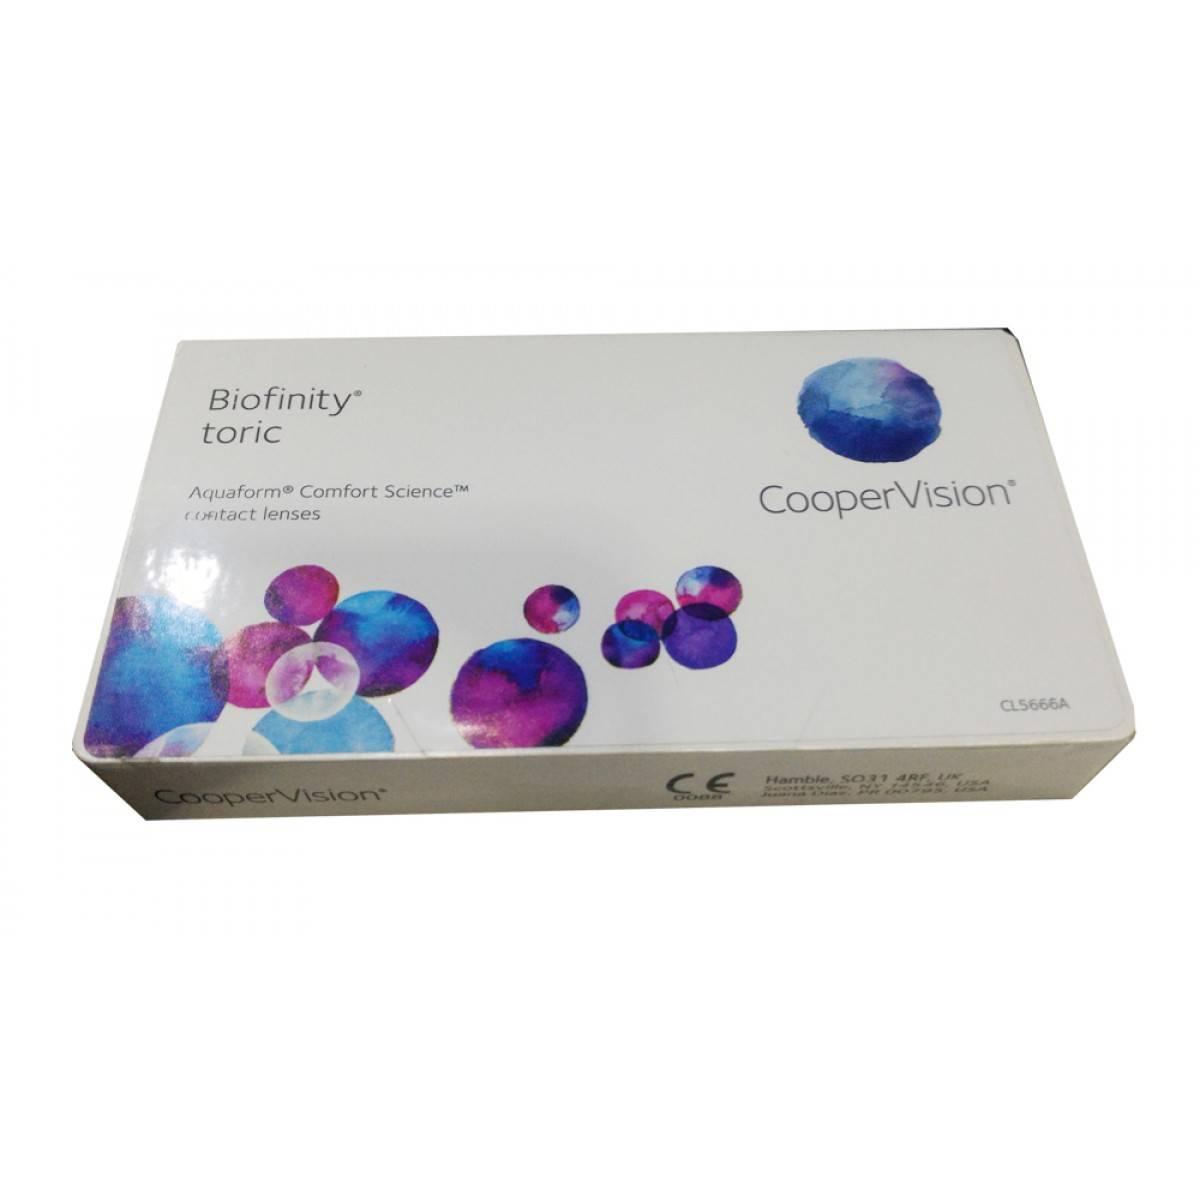 Биофинити линзы - отзывы про контактные biofinity cooper vision